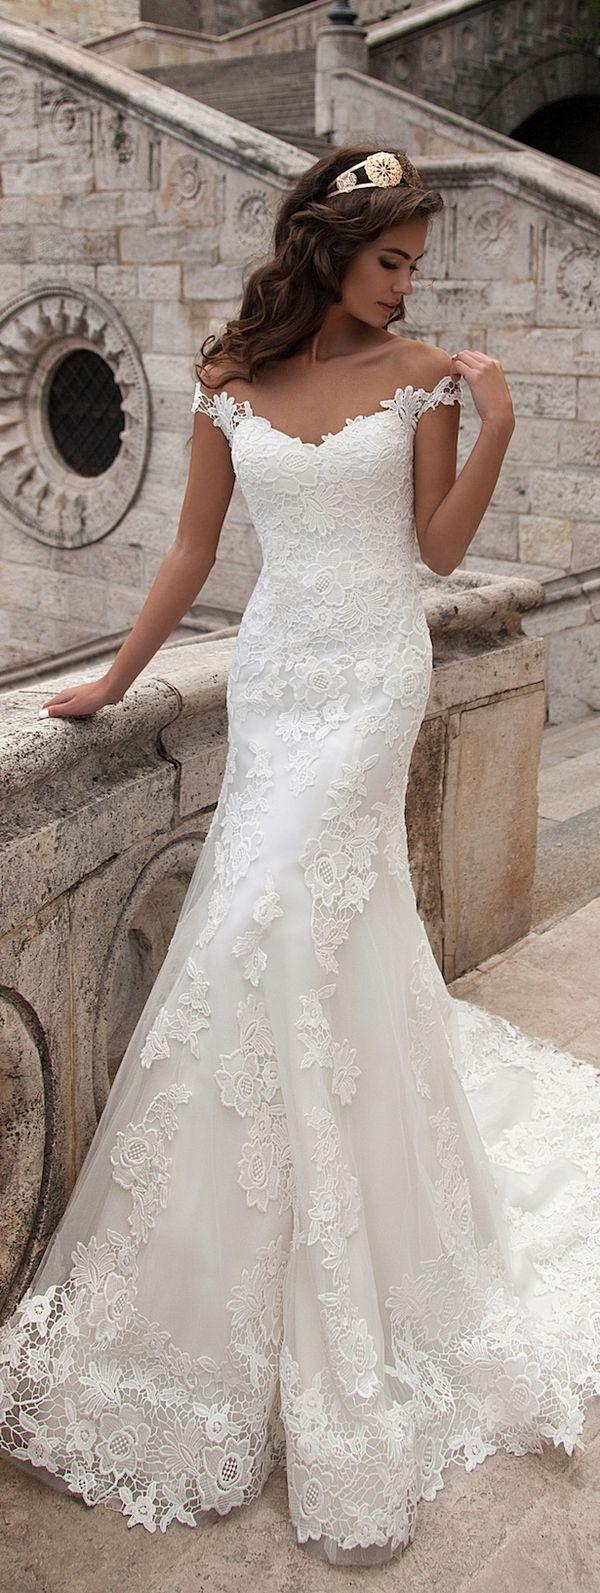 Wedding-Dresses-0854